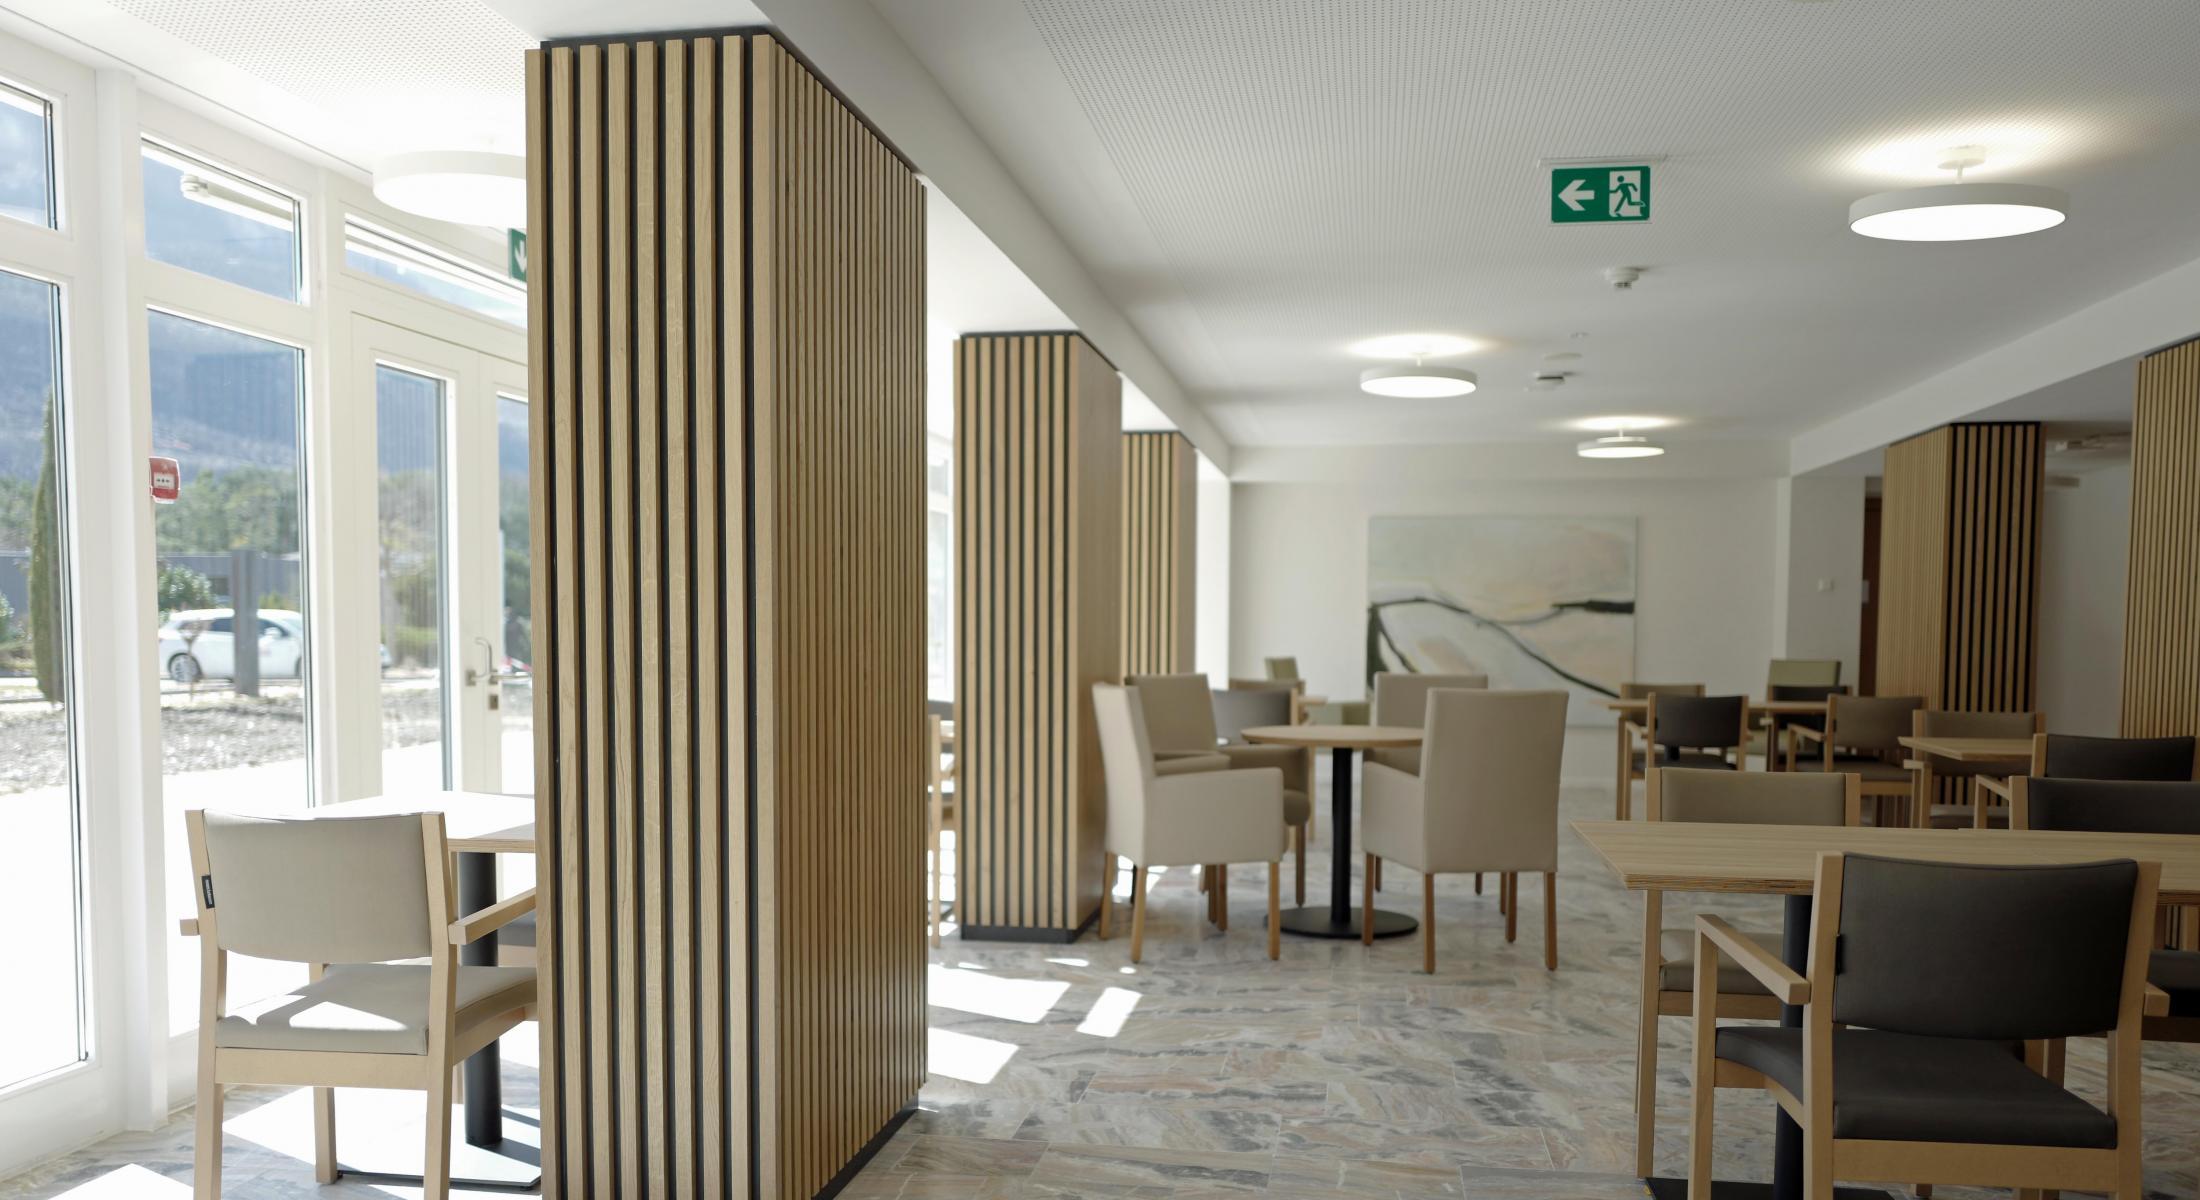 Creating Hospitality - La residence Plantzette 9 - moments furniture